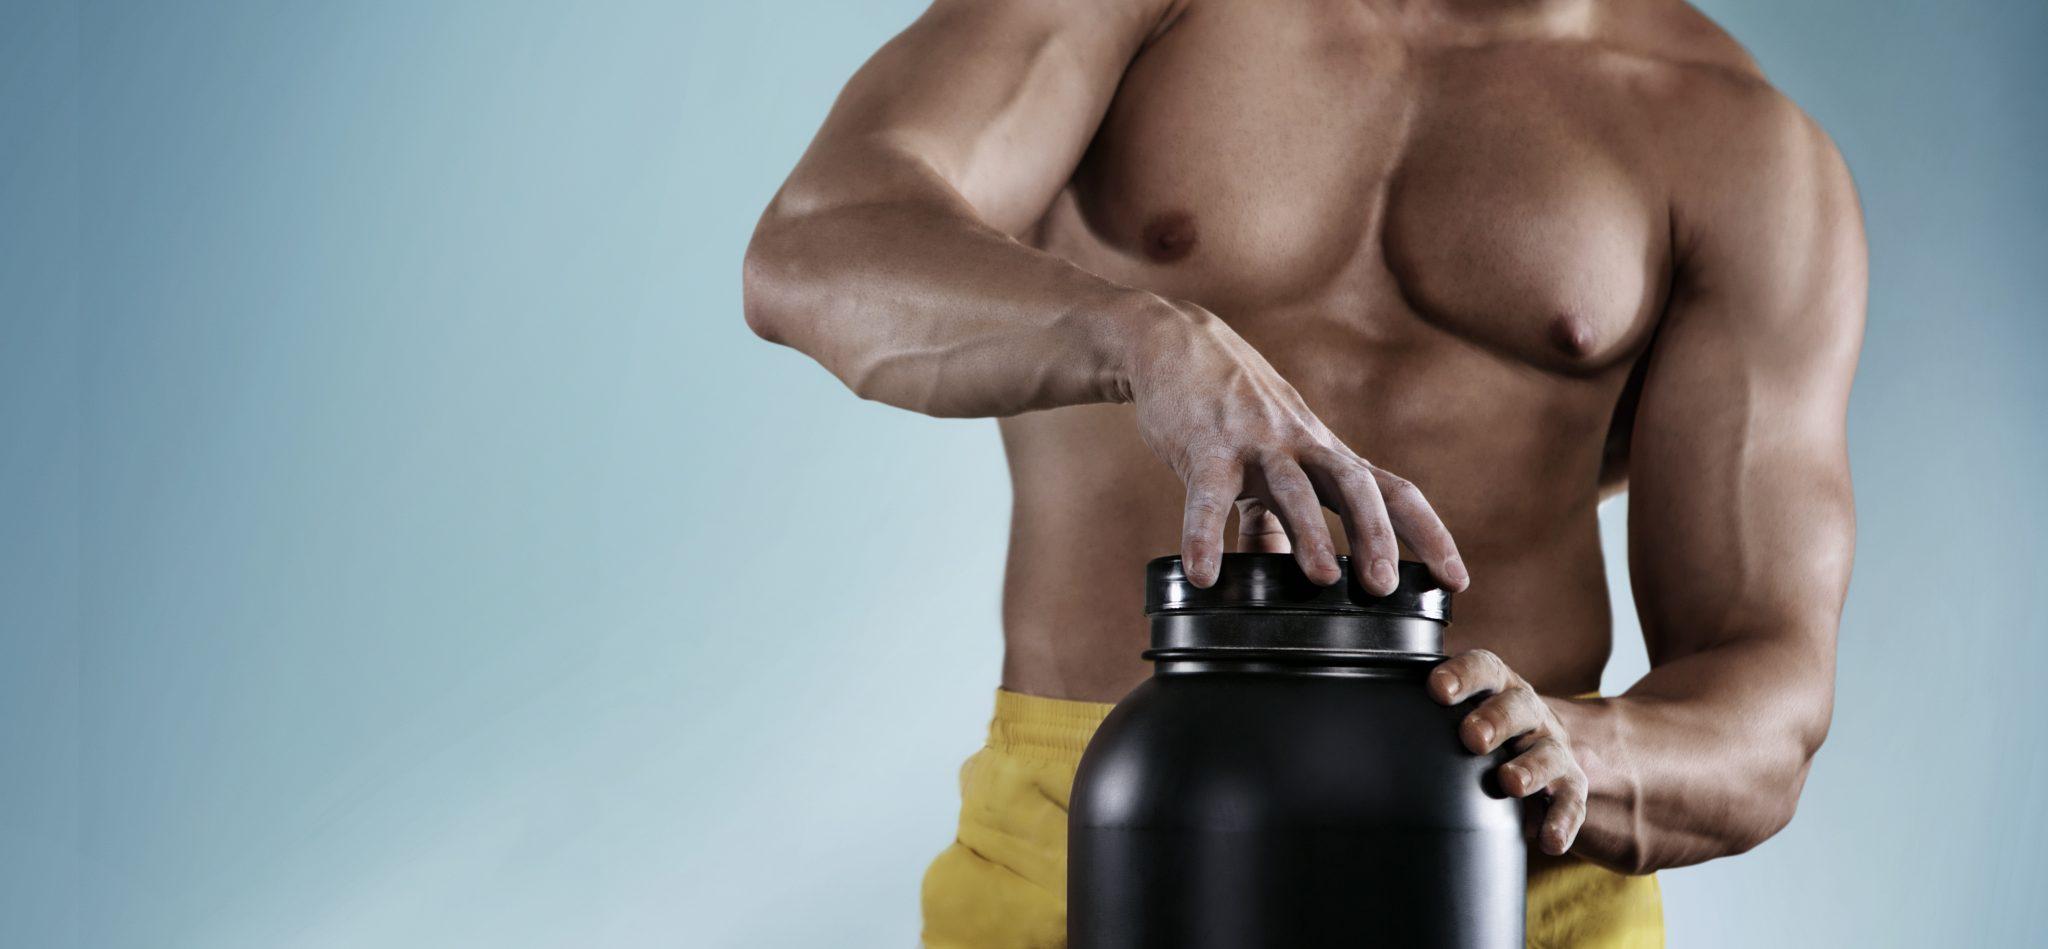 Proteina caseina adelgazar los brazos